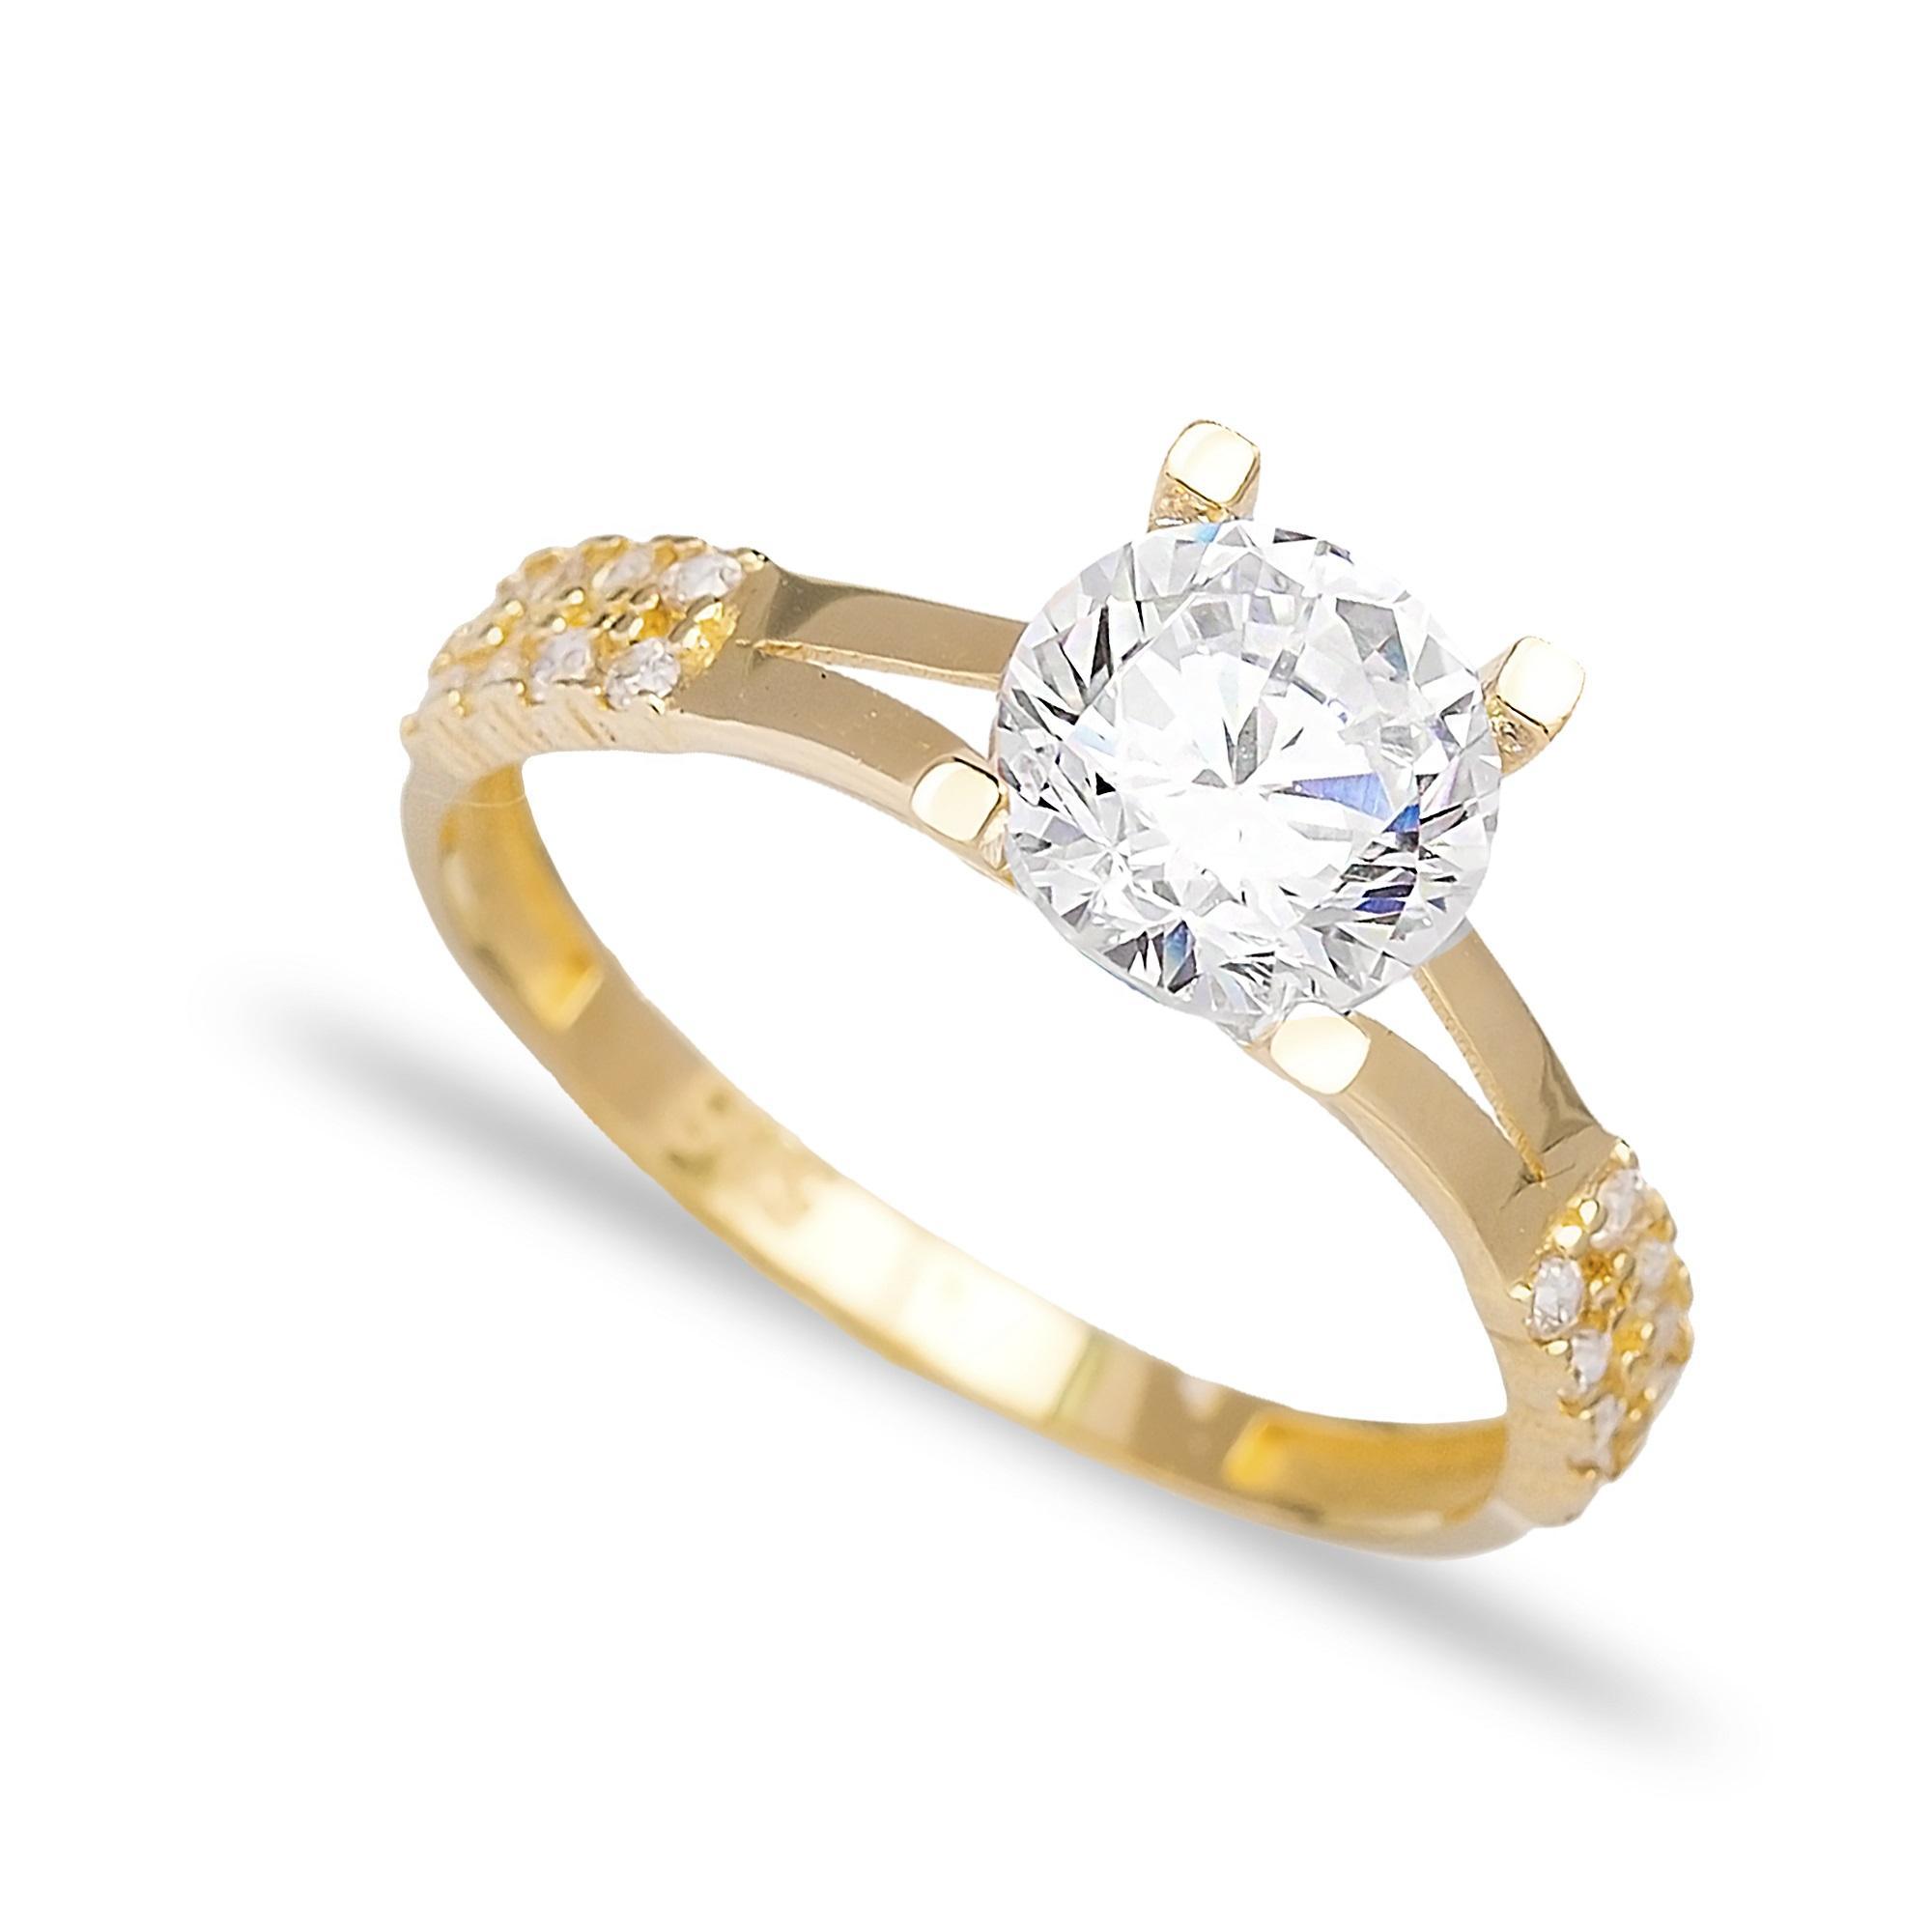 Engagement Solitaire 14 Karat Gold Zirconia 7 mm Wholesale Handmade Turkish Jewelry